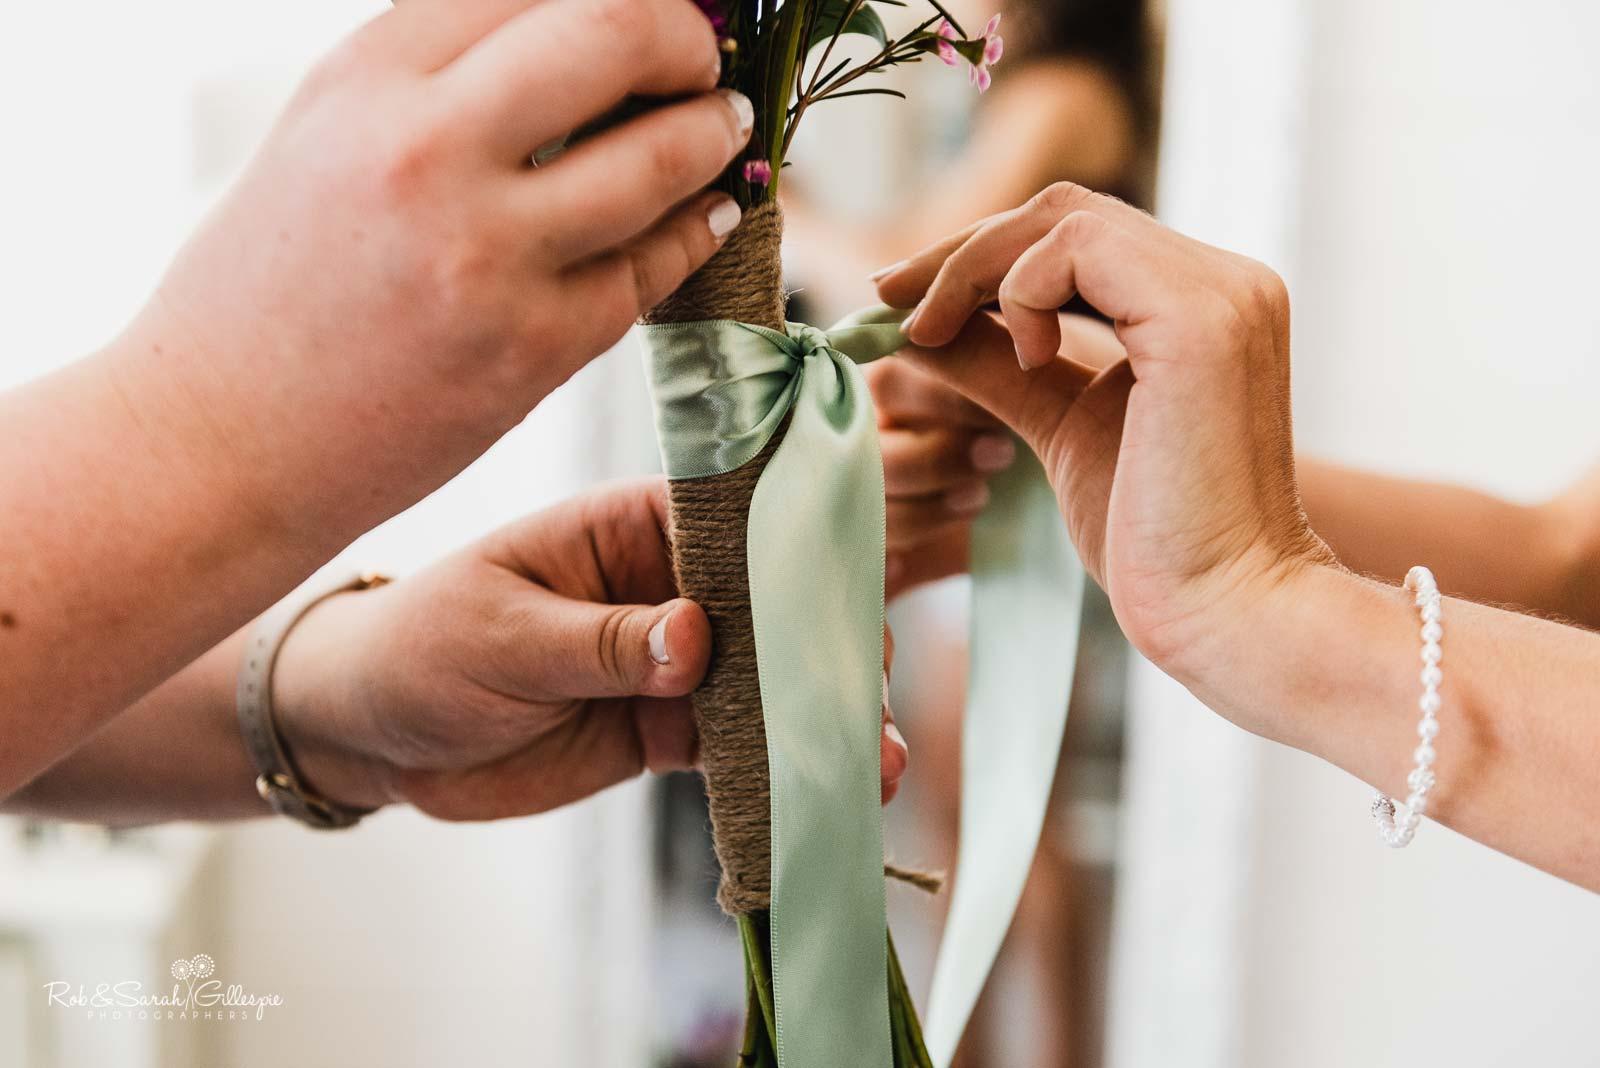 Bride preparations at Wethele Manor